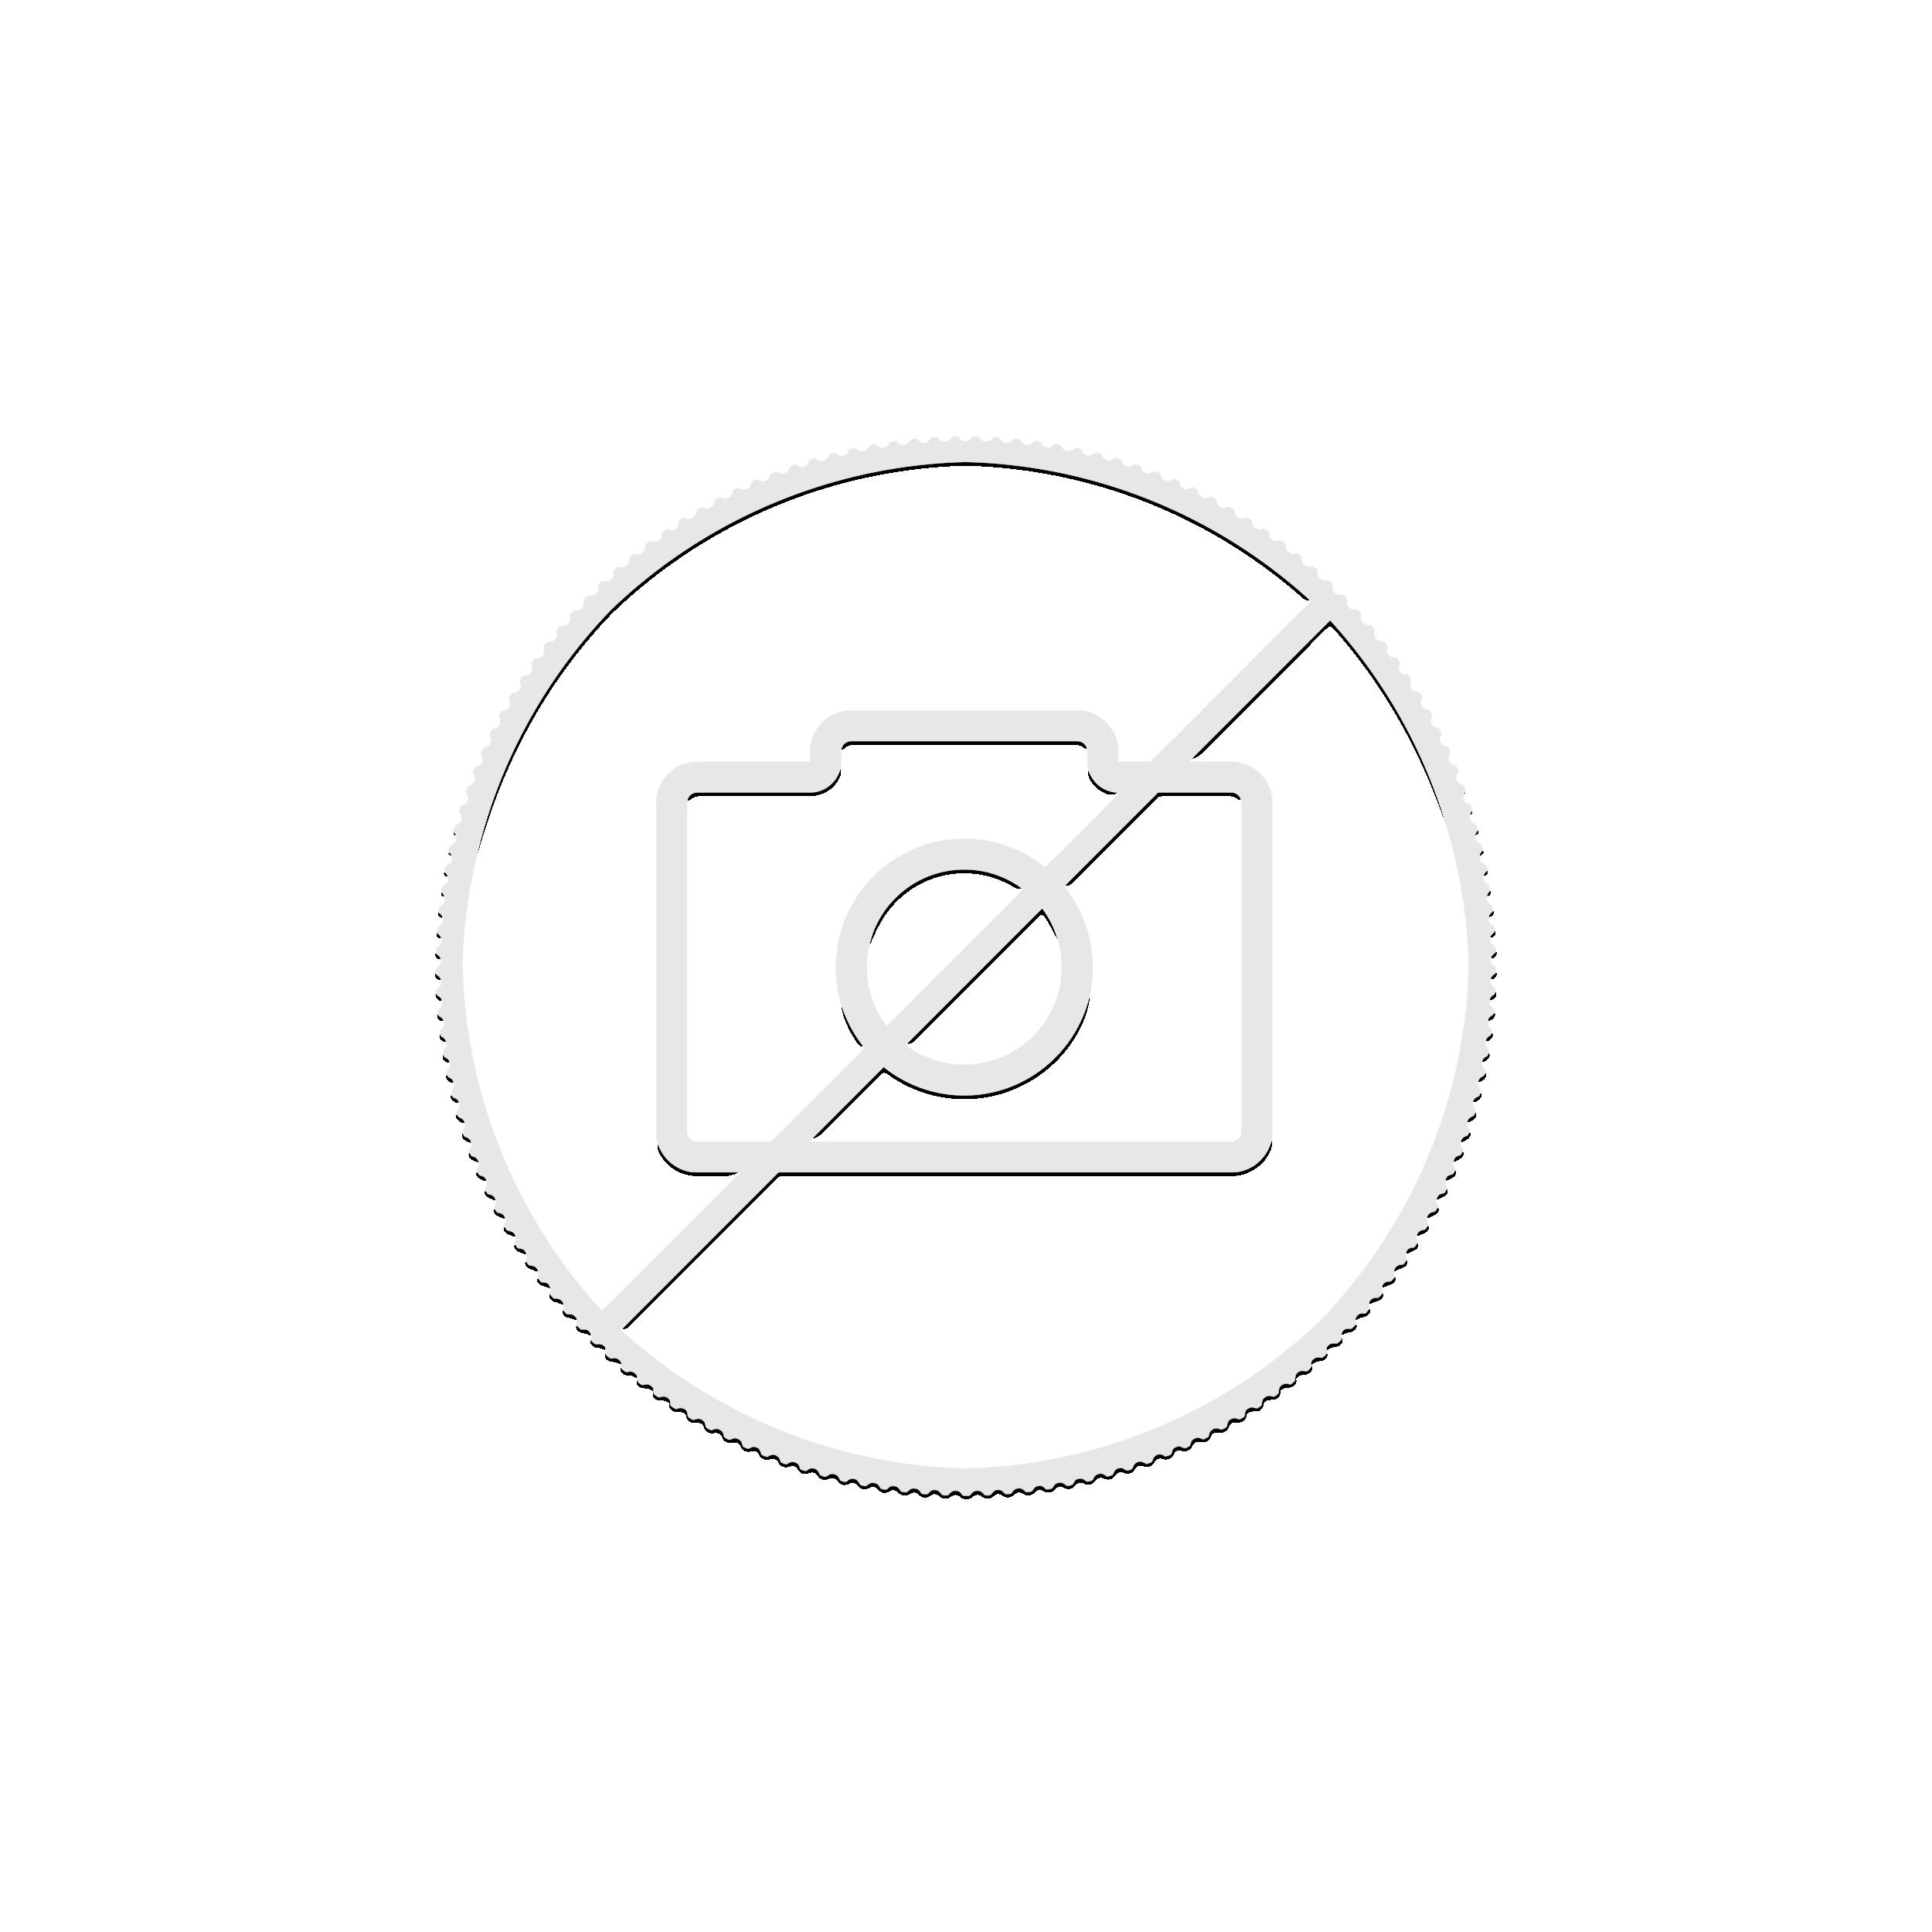 Gold 1/10 troy ounce Vienna Philharmonic coin 2019